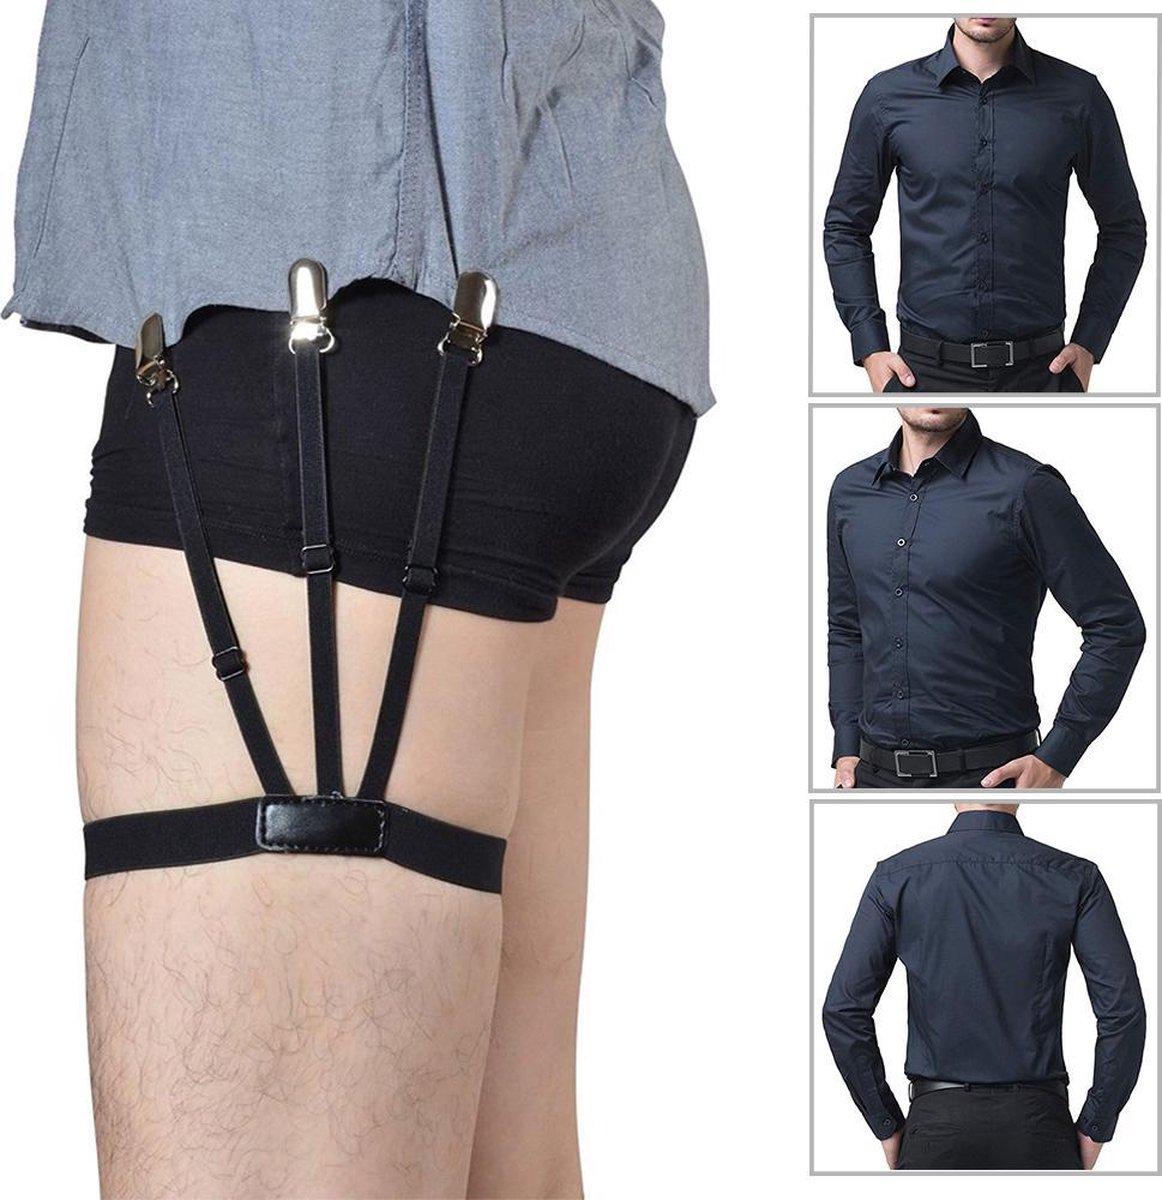 Overhemd Bretels Heren Mannelijke Jarretels Garters Zakelijke outfit Strak shirt Mannen kleding accessoires Bruitloft Smoking Vrouwen